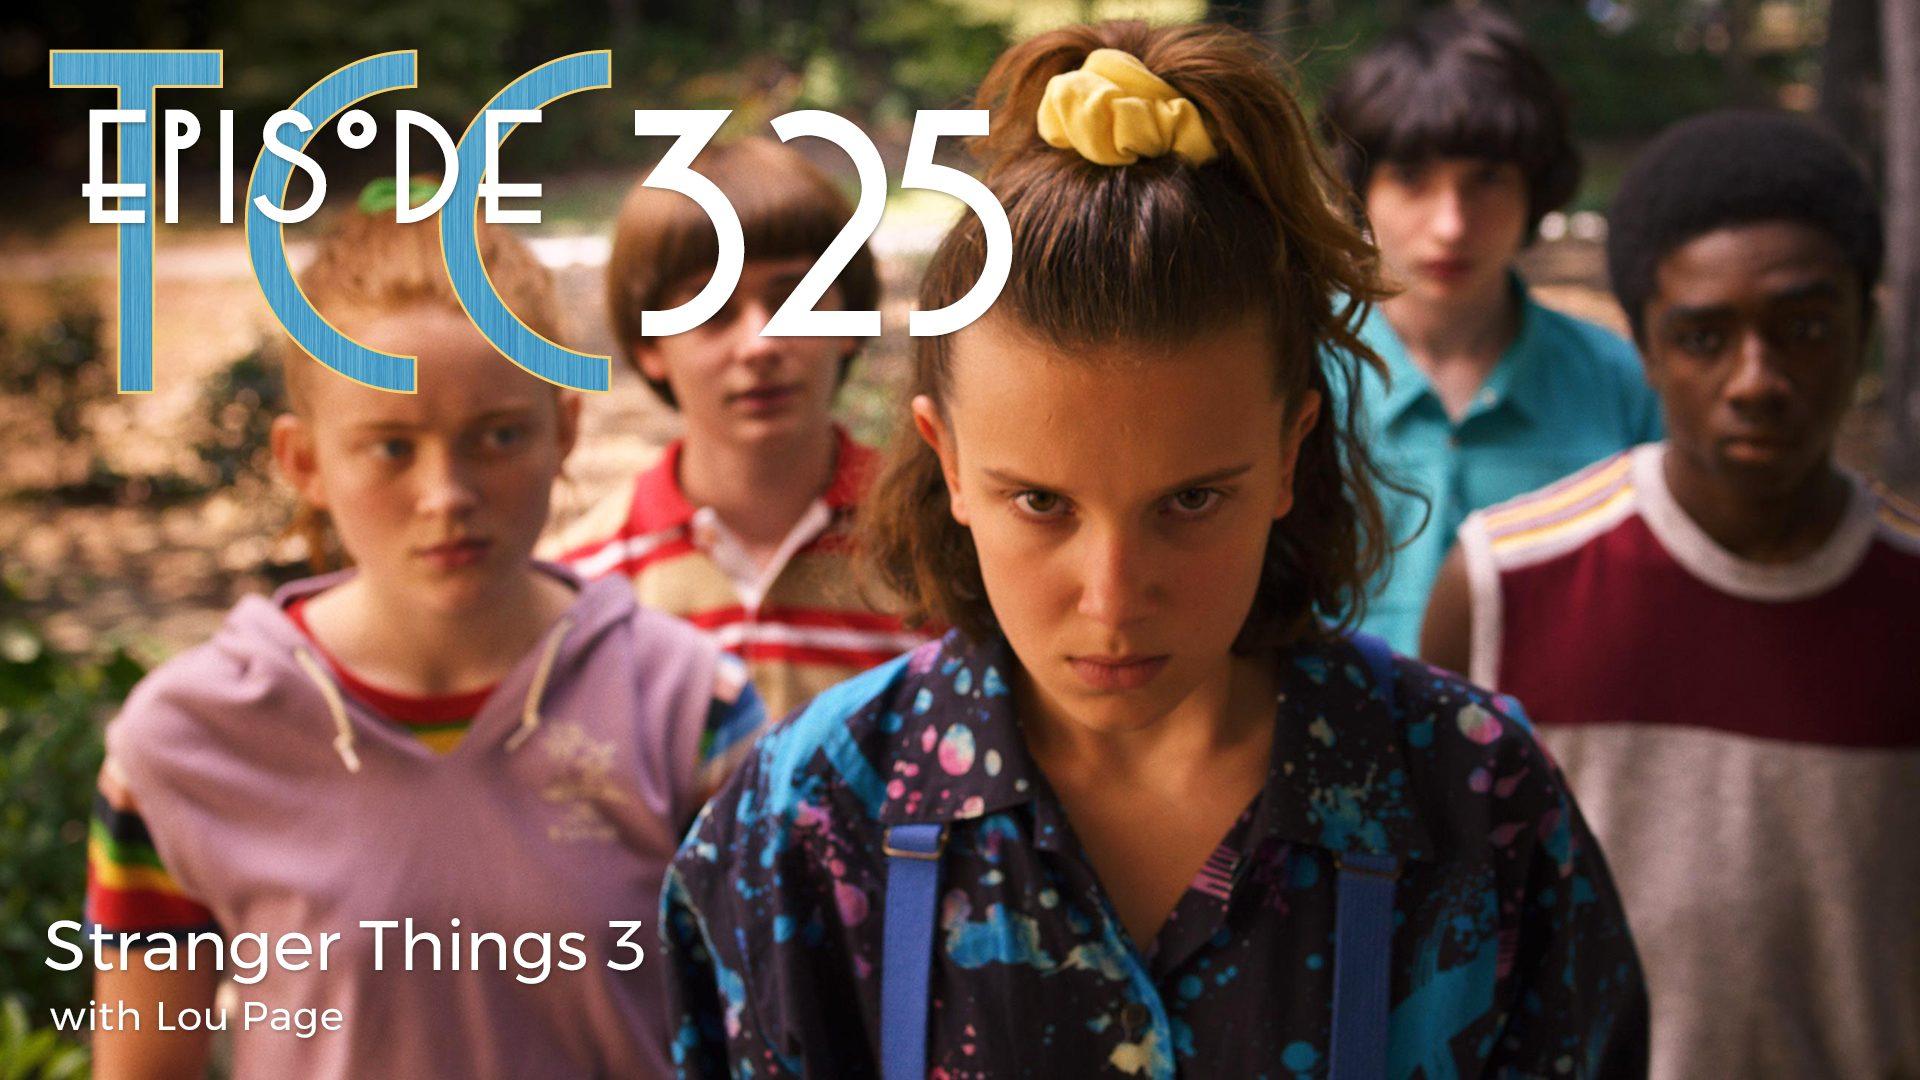 The Citadel Cafe 325: Stranger Things 3